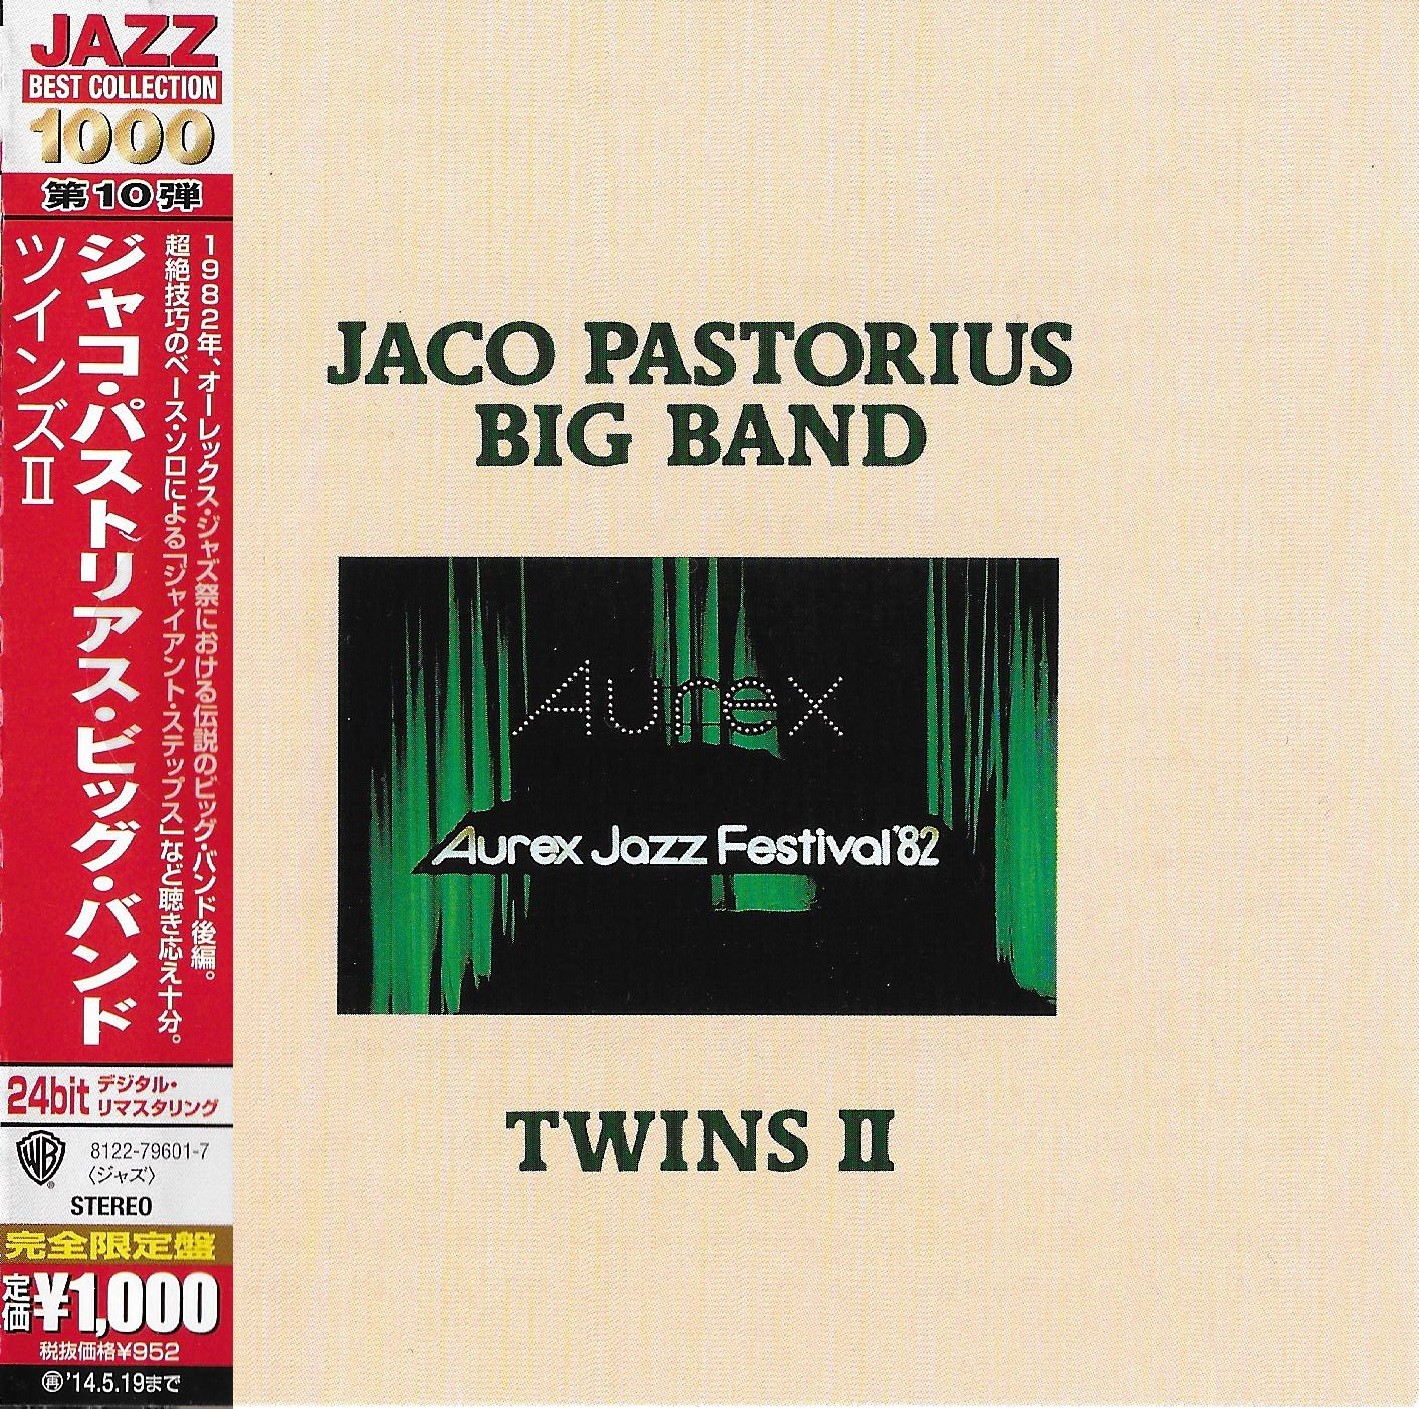 Jazz rock fusion guitar jaco pastorius big band 1982 2013 jaco pastorius big band 1982 2013 twins ii stopboris Gallery